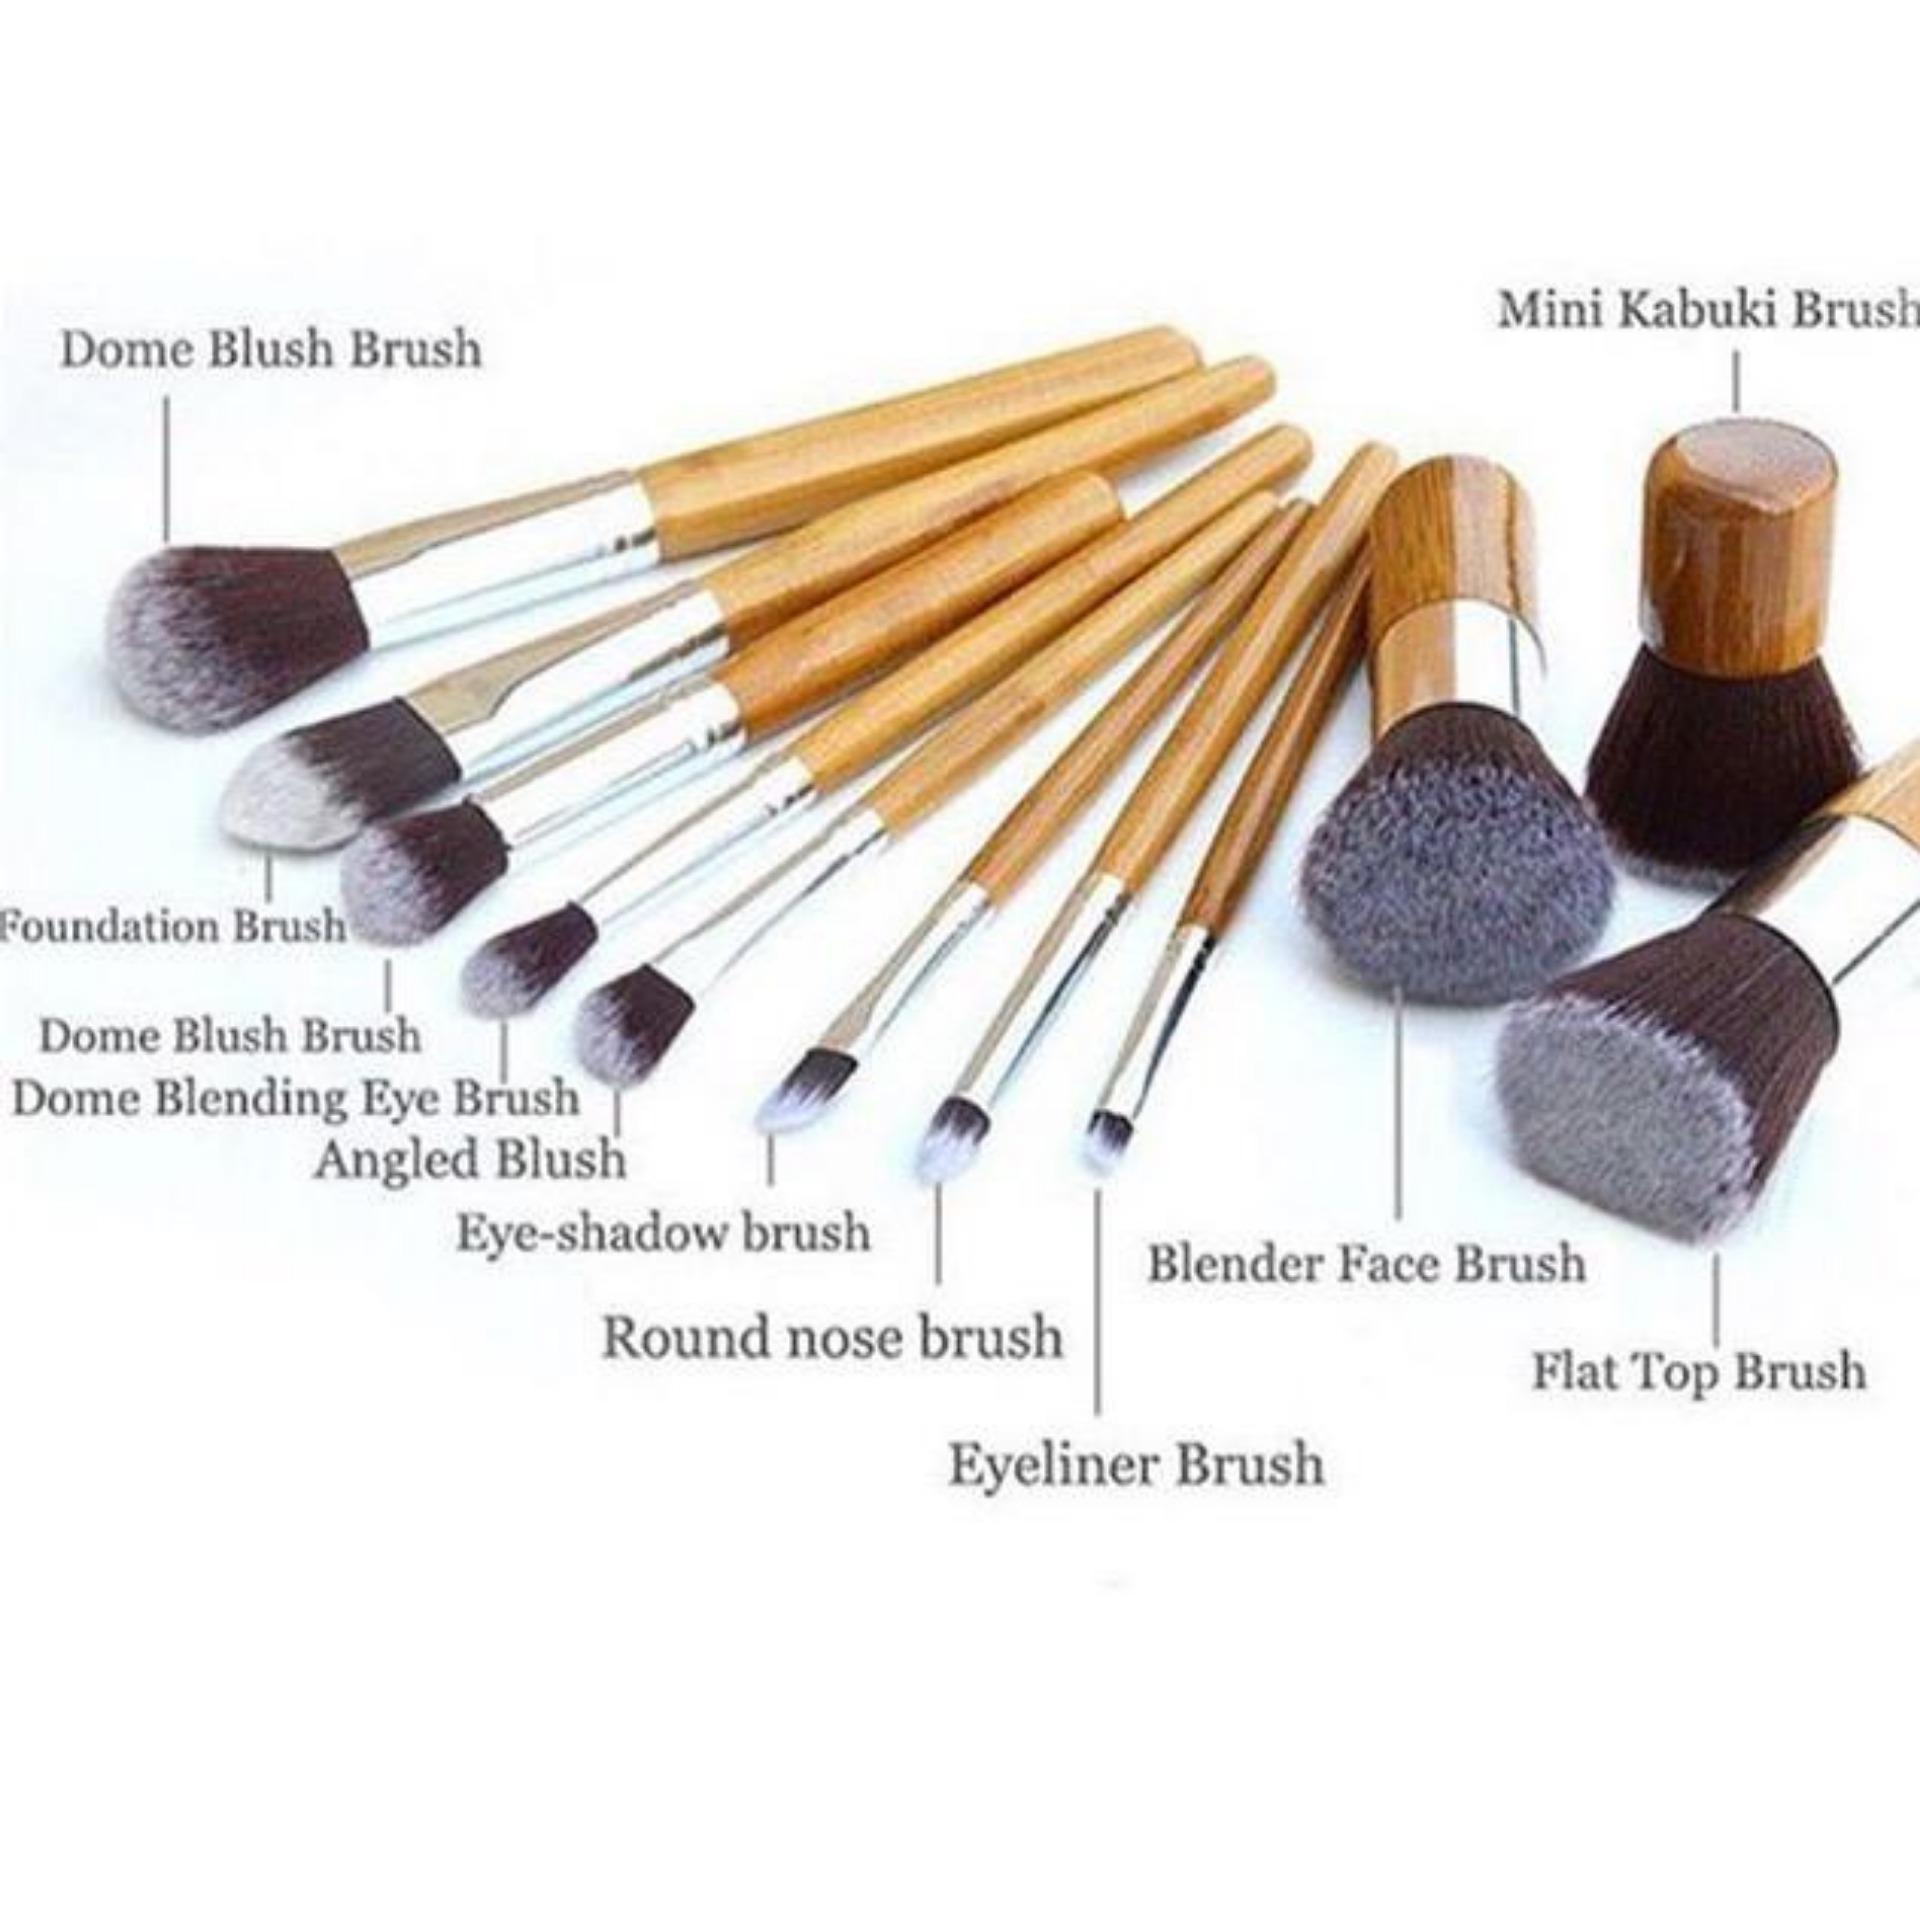 Vienna Linz Kuas Make Up Cosmetic Brush 11 Pcs With Pouch Jbs New York Dompet Tas Makeup Maroon Bamb Set